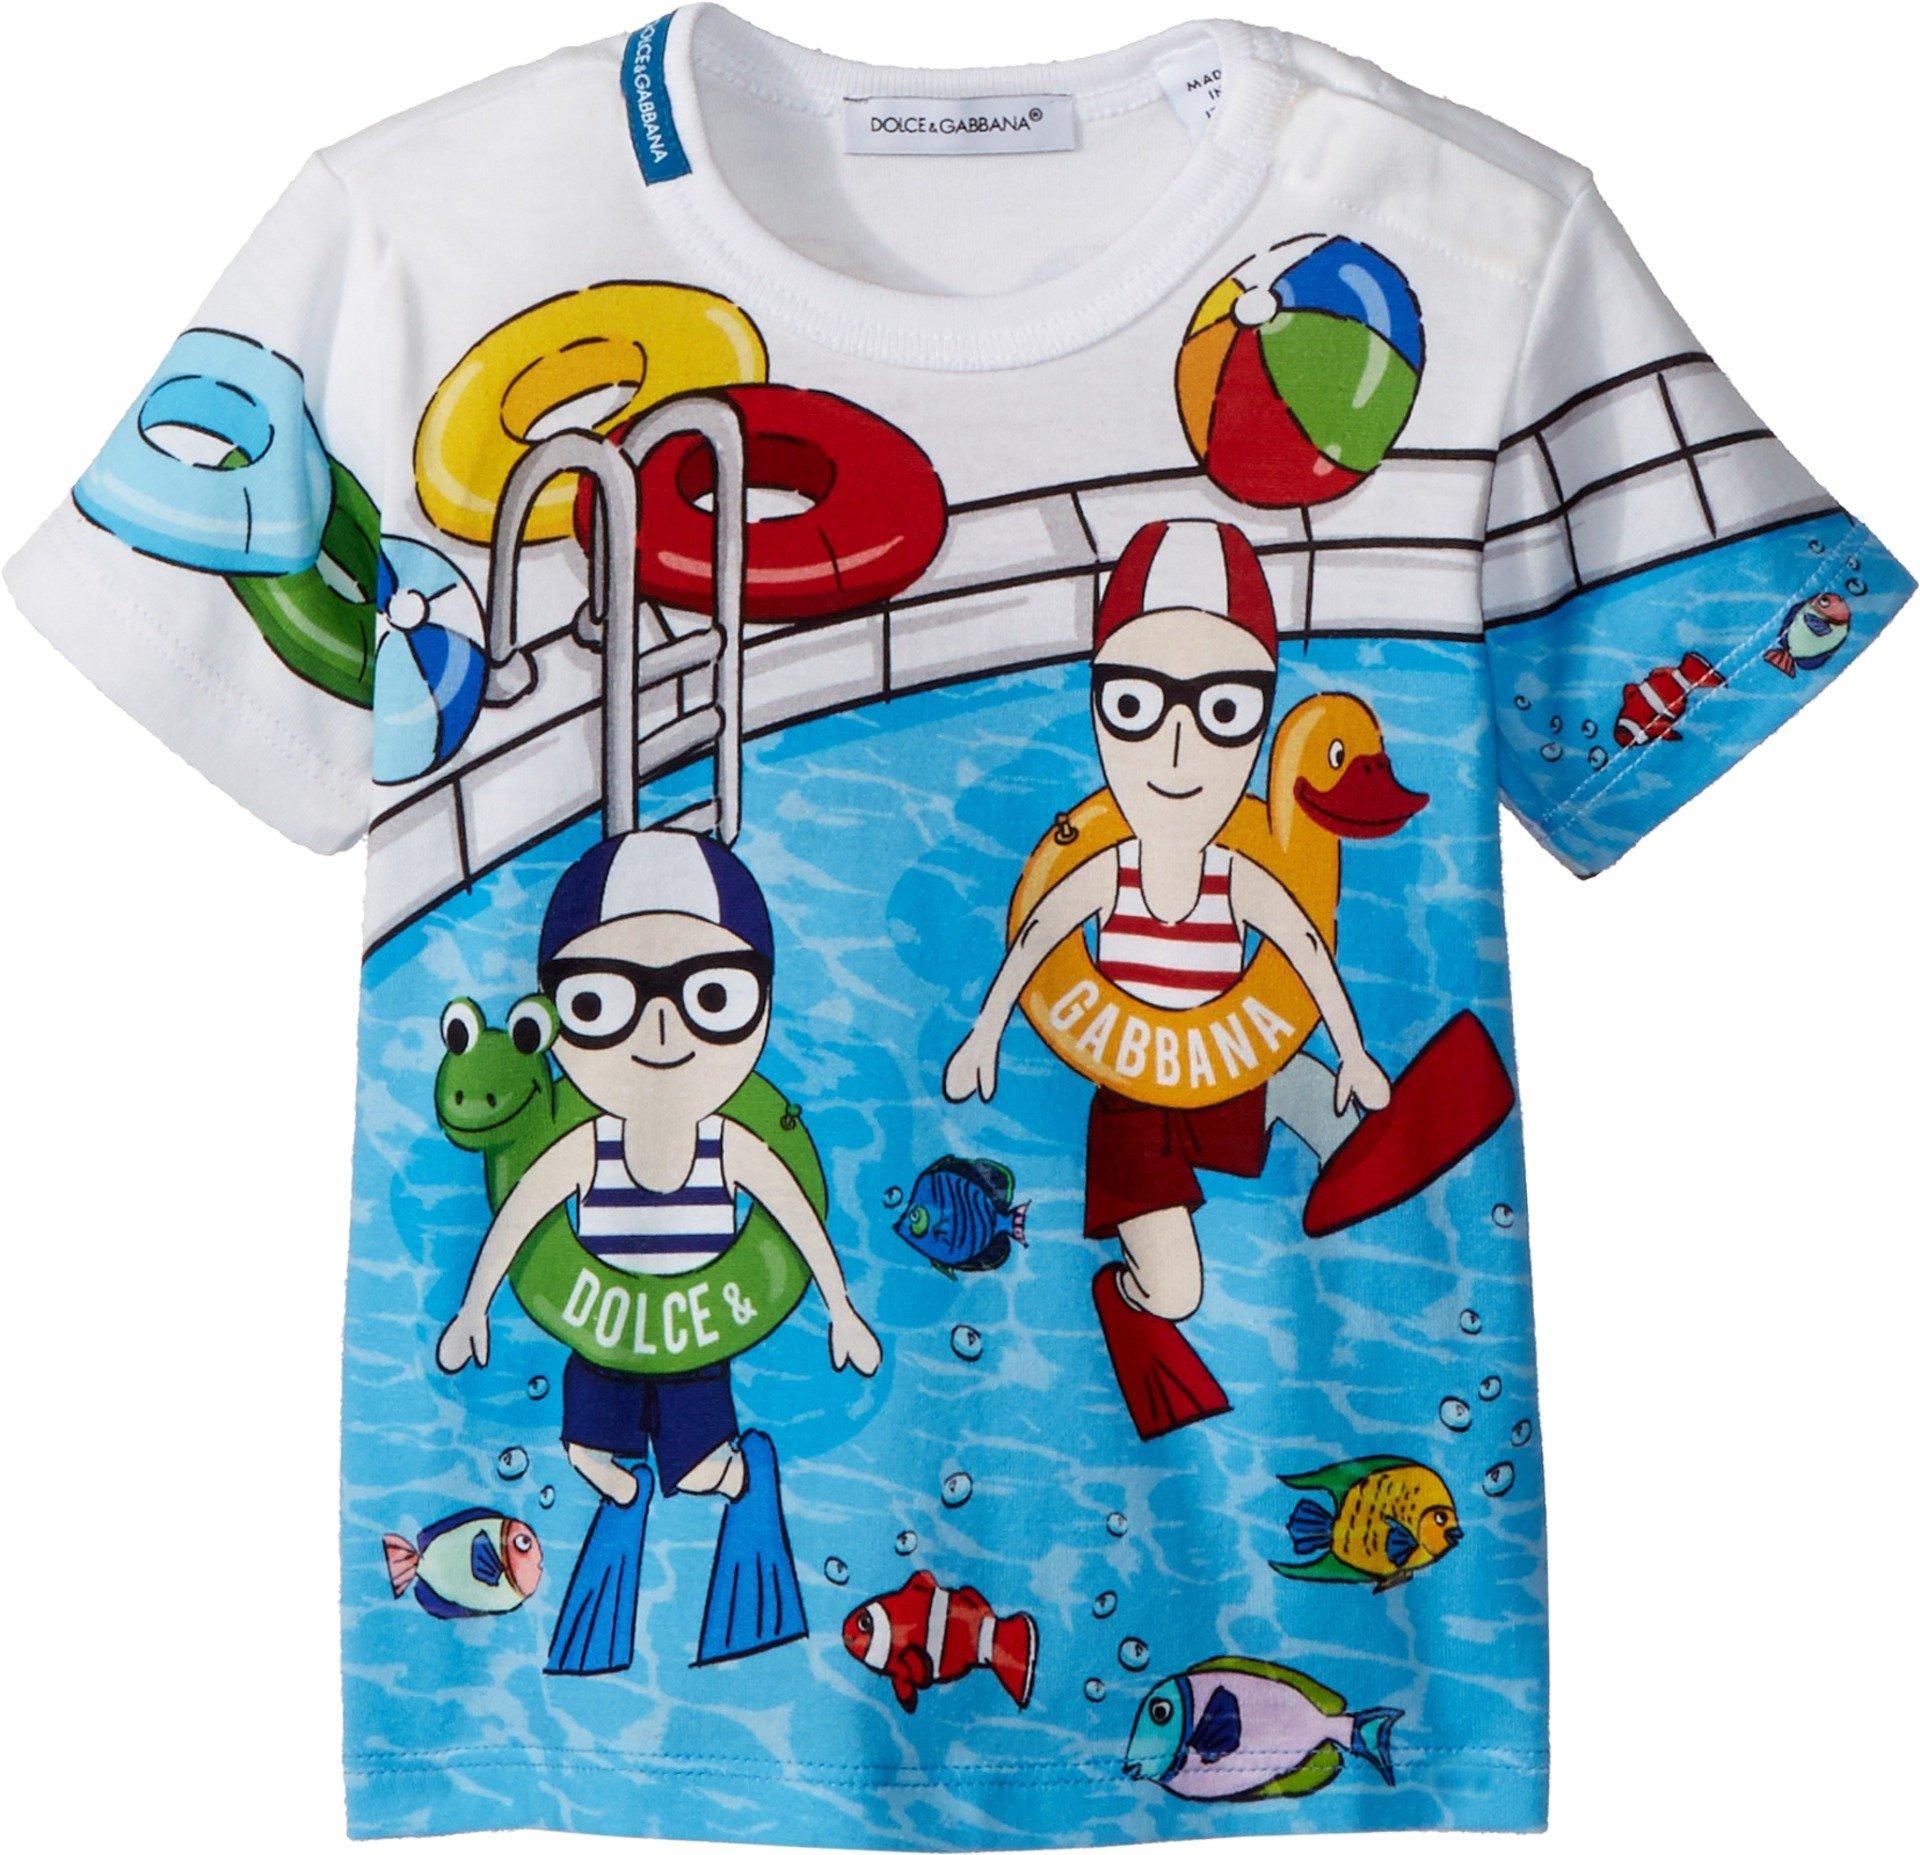 Dolce & Gabbana Kids Baby Boy's T-Shirt (Infant) Blue Print 6-9 Months